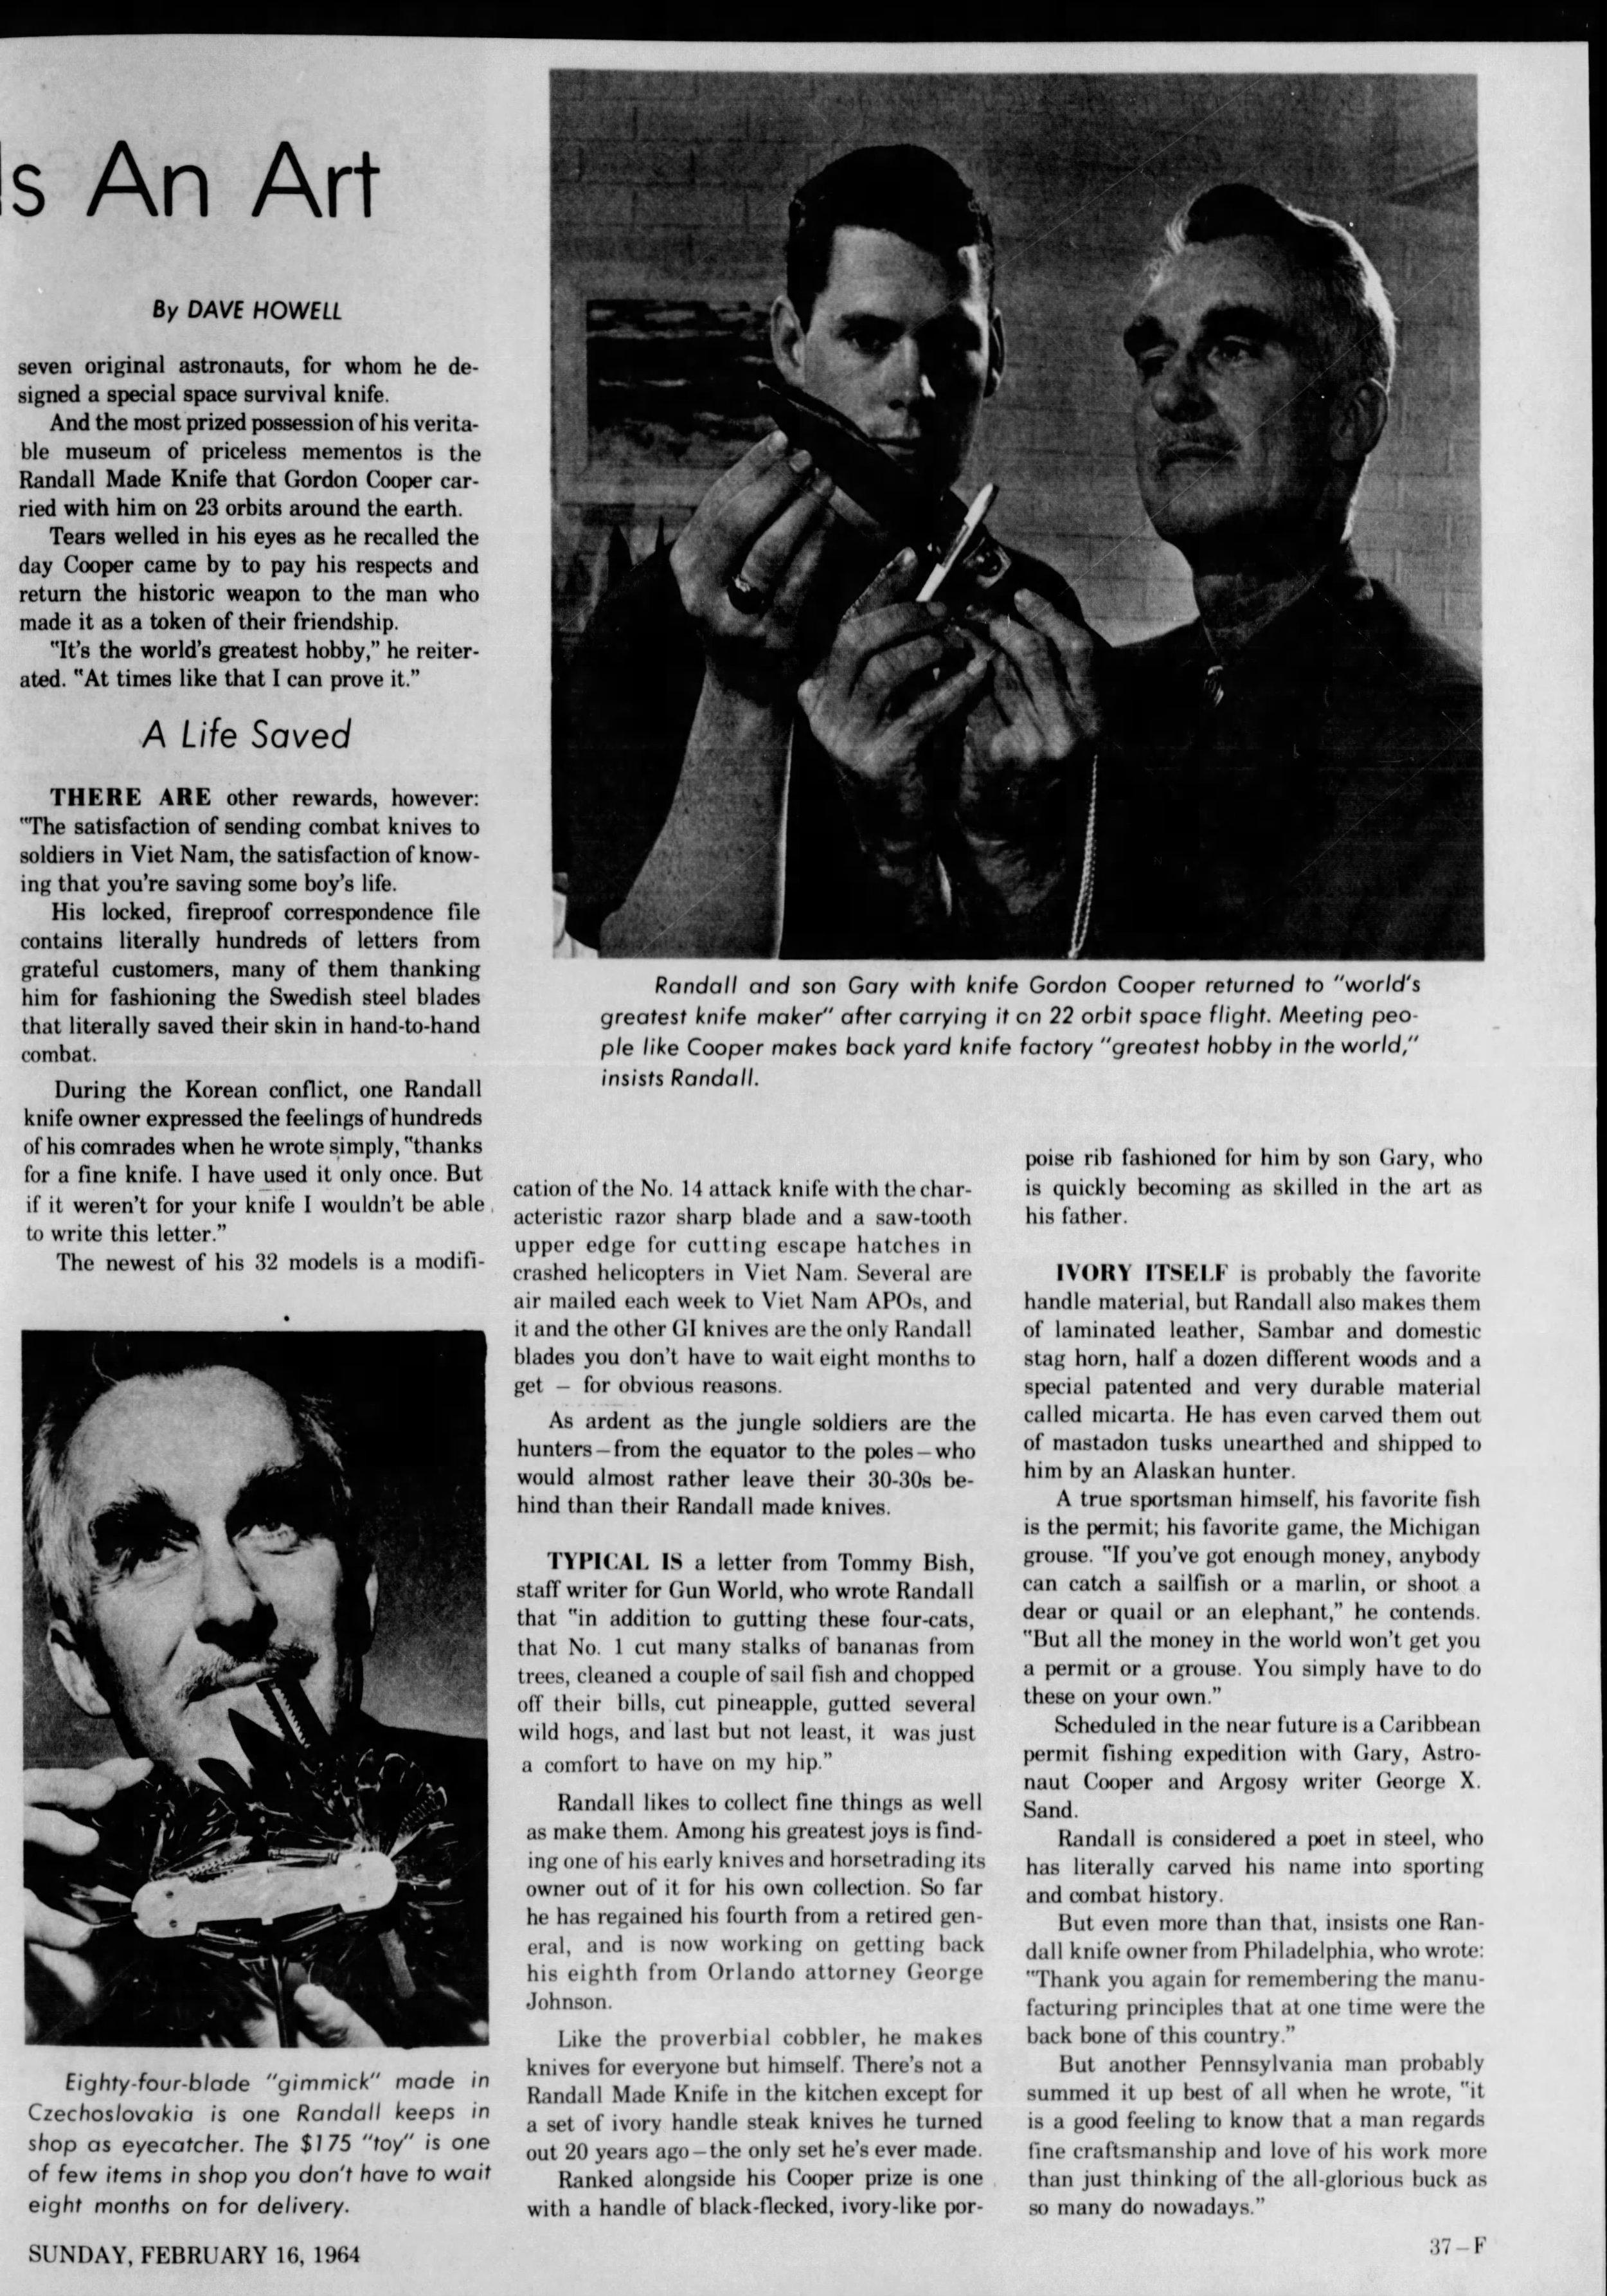 The_Orlando_Sentinel_Sun__Feb_16__1964_ (1).jpg